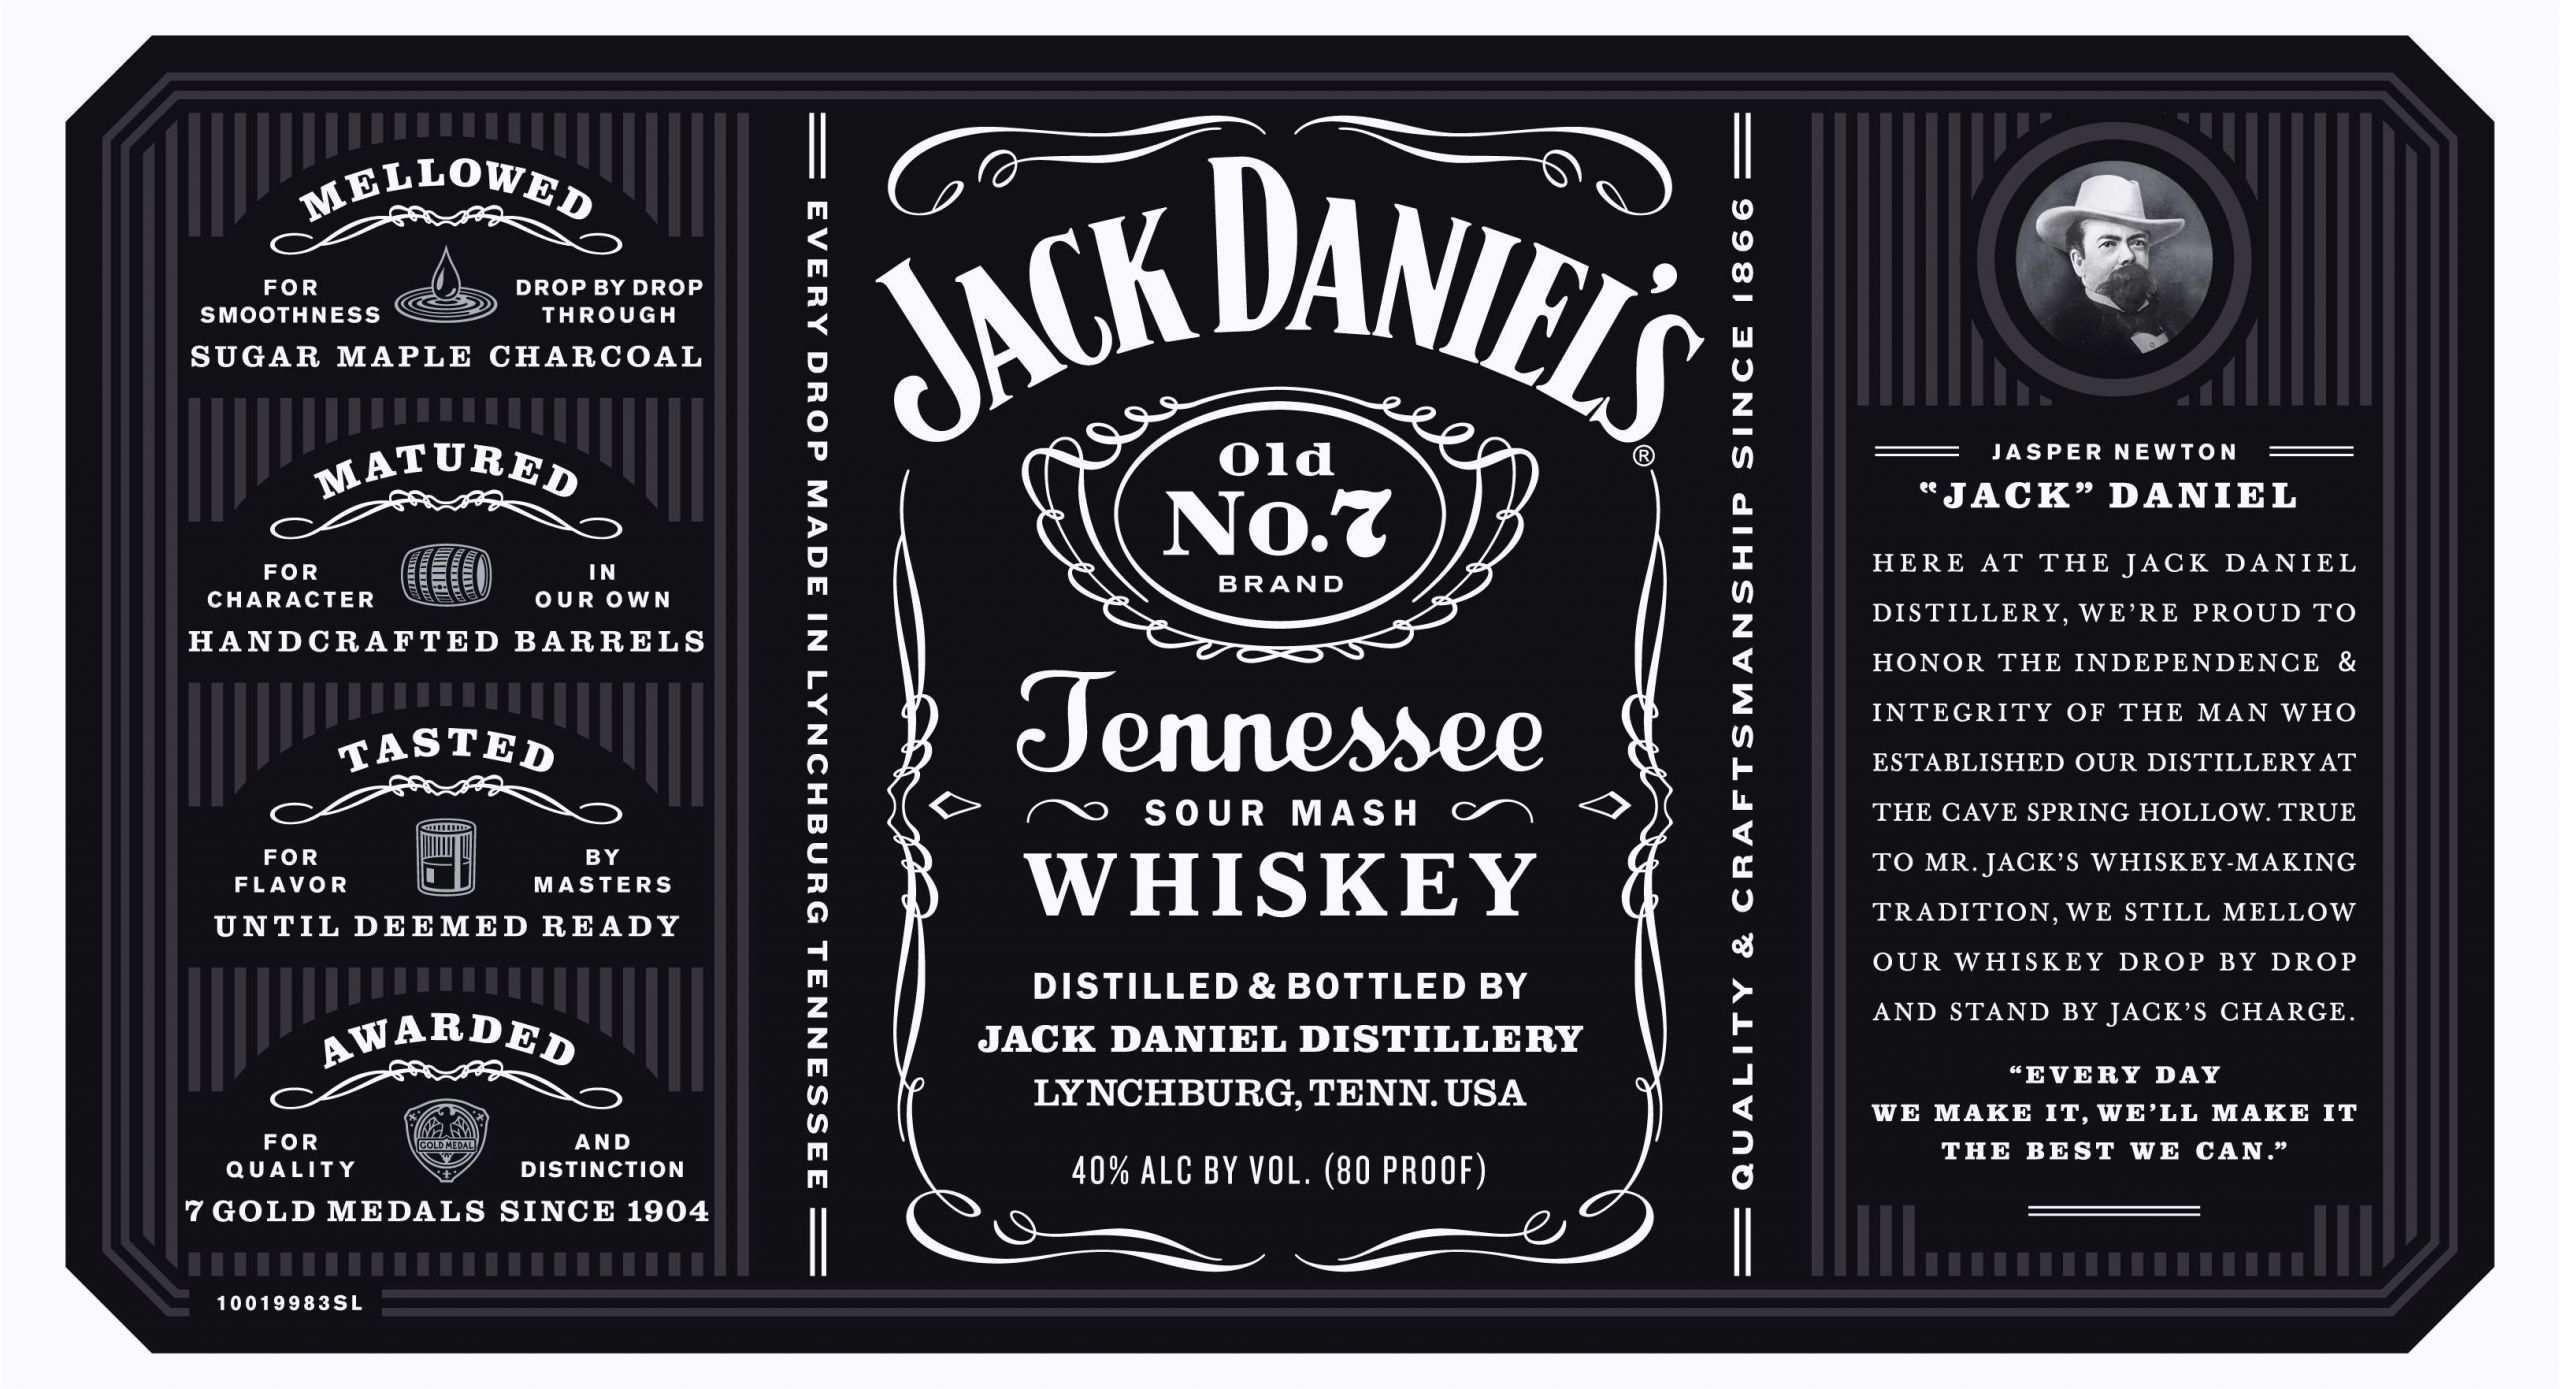 Jack Daniels Label Template Fresh Jack Daniels Etikett Vorlage Elegant Jack Daniels Jack Daniels Liquor Bottle Labels Jack Daniels Label